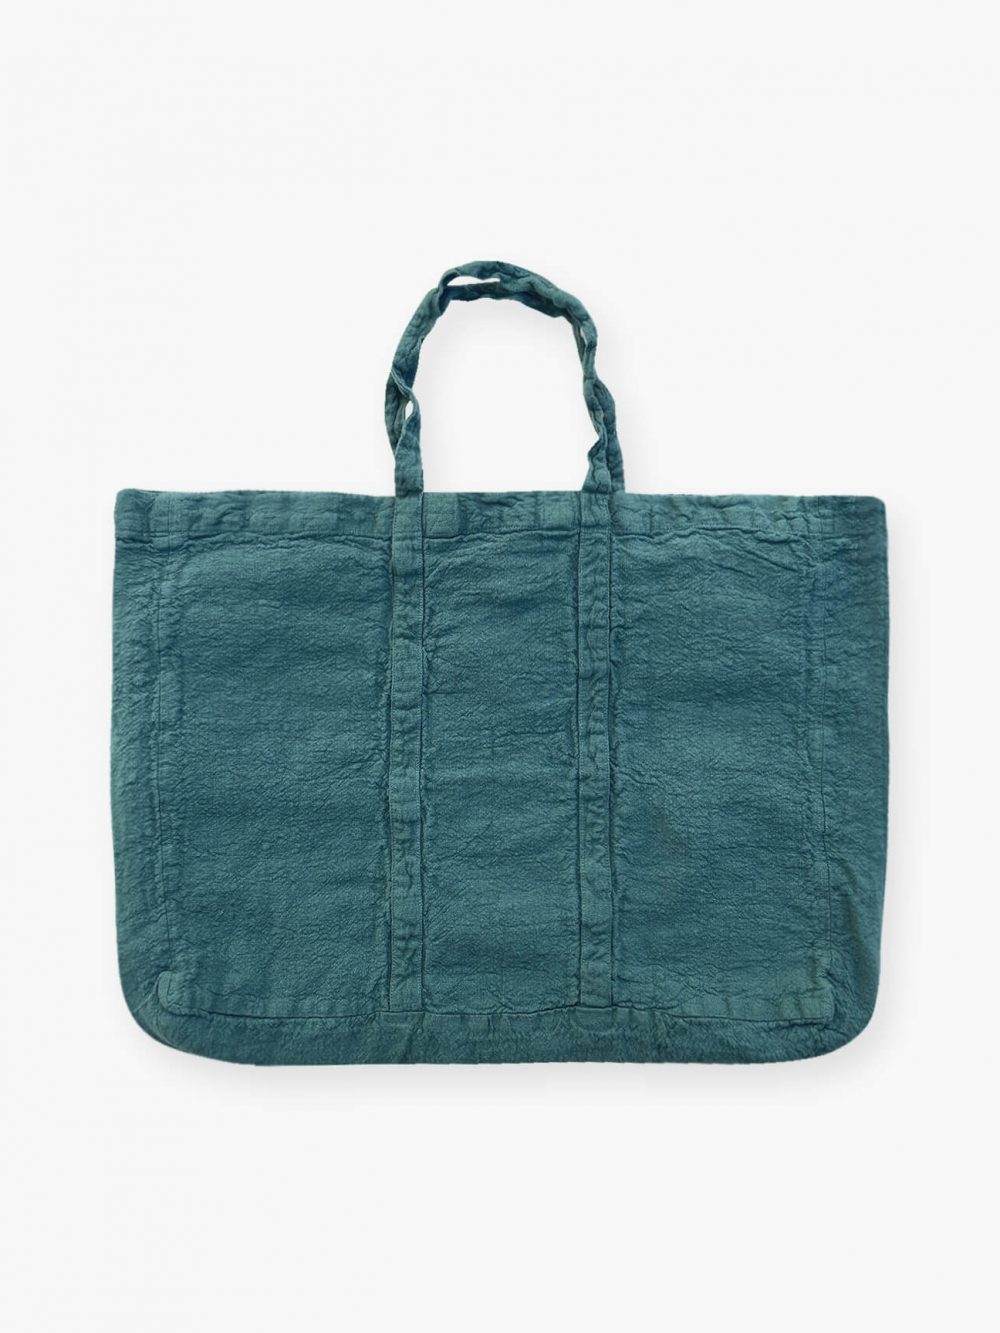 Sac de plage vegan bleu vert viride en lin français de la marque comptoir des teintures Made in France